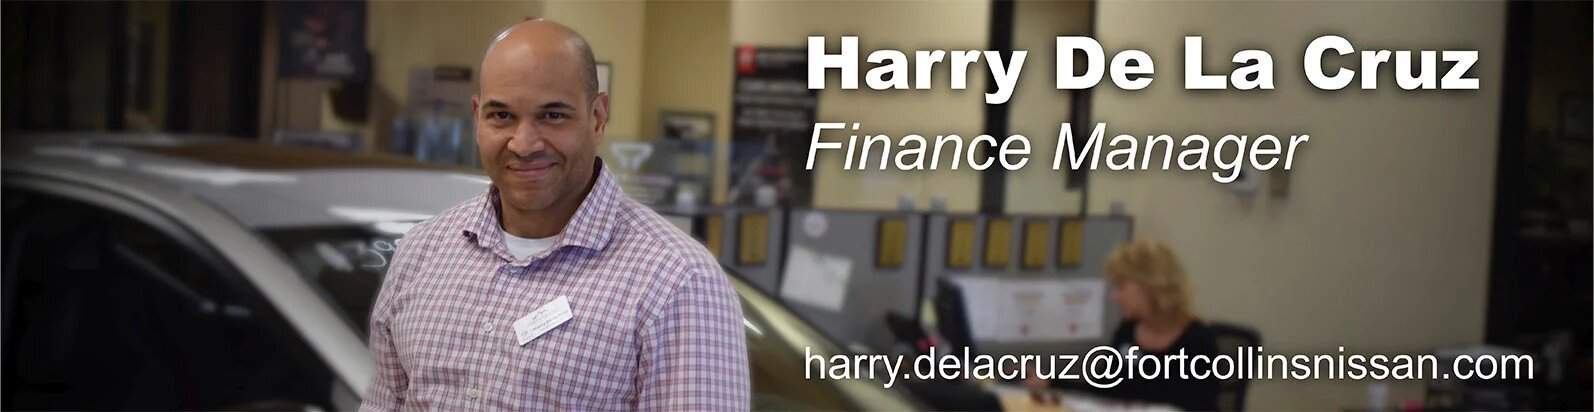 Finance Manager Harry De La Cruz